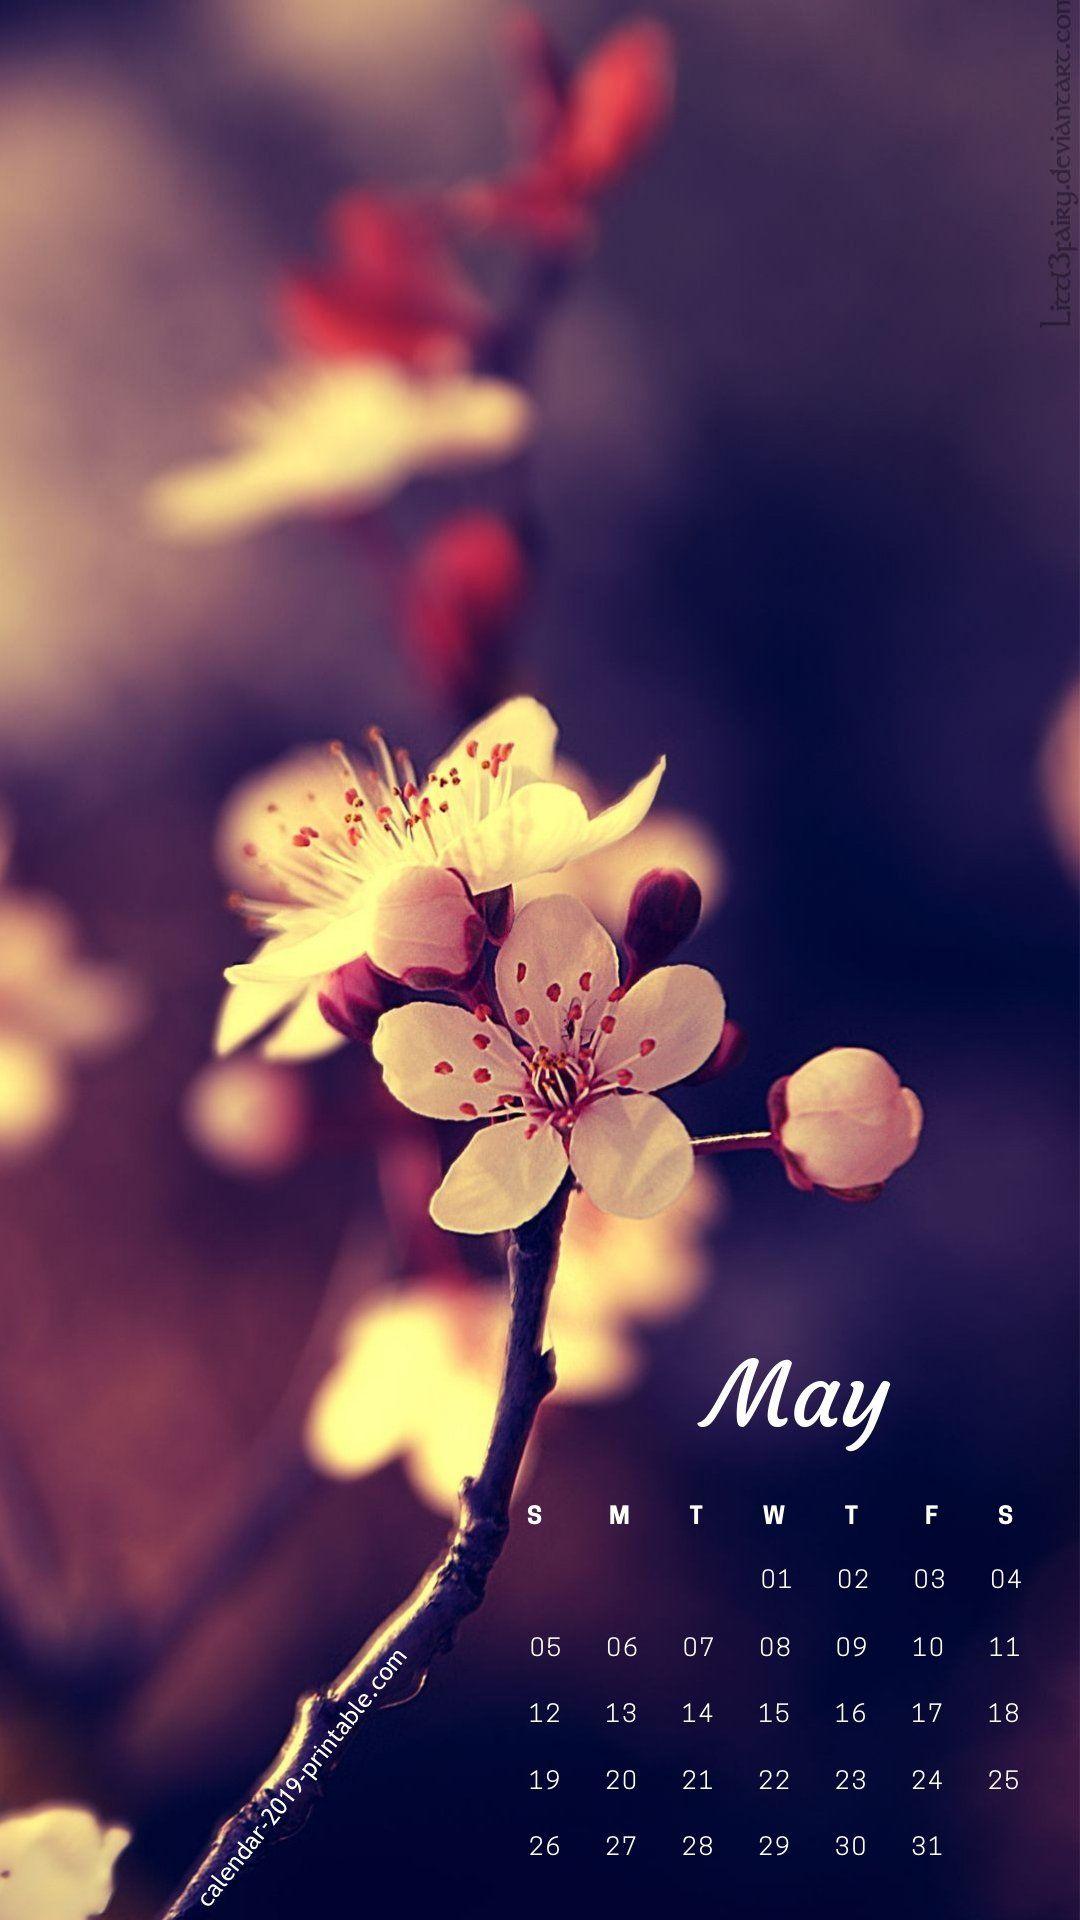 may 2019 iphone calendar flower wallpaper 2019 Calendars in 2019 1080x1920